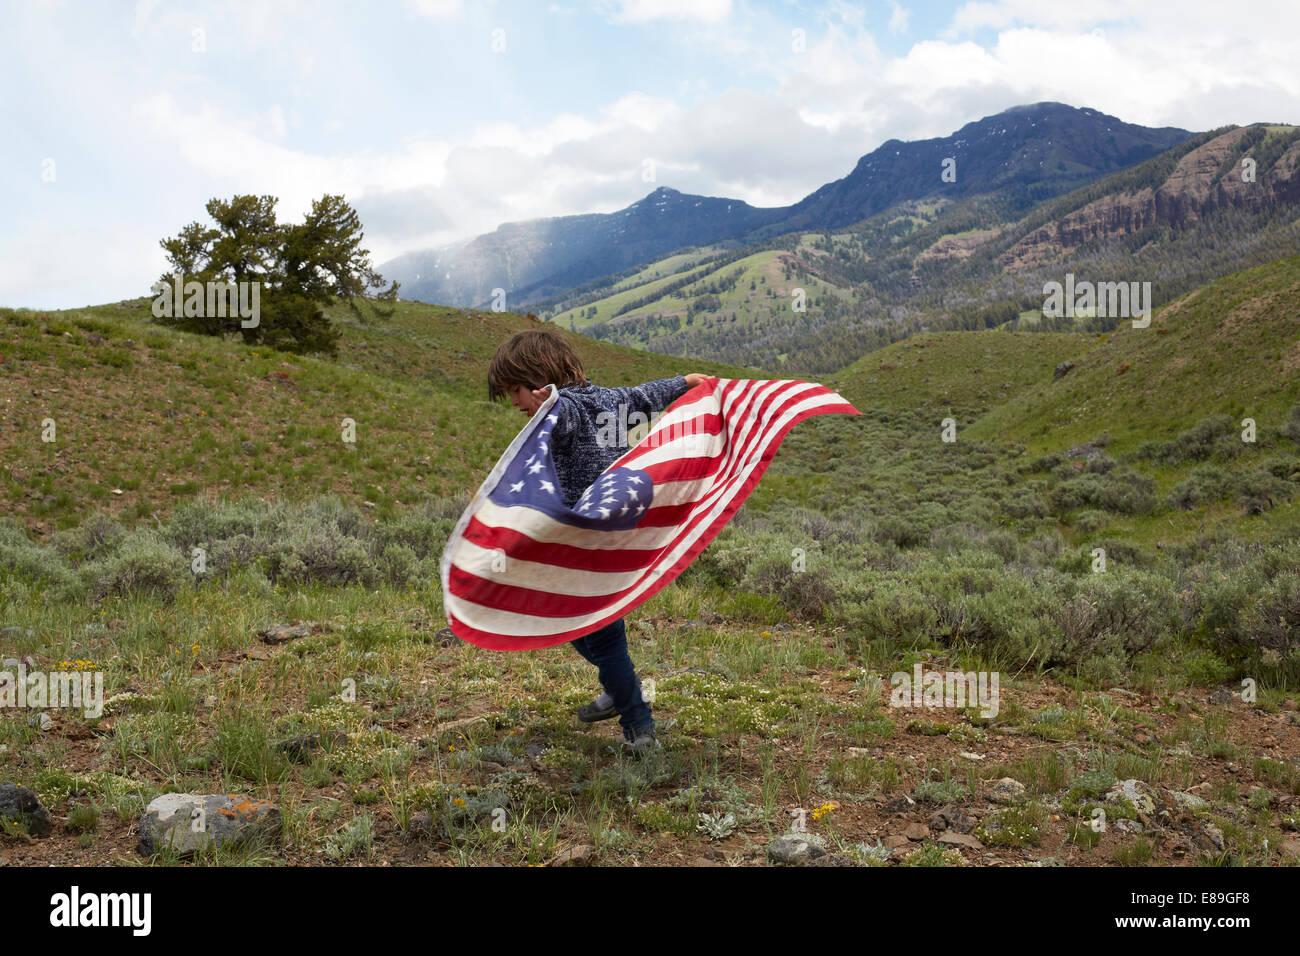 Junge amerikanische Flagge in sanften Hügeln Stockbild